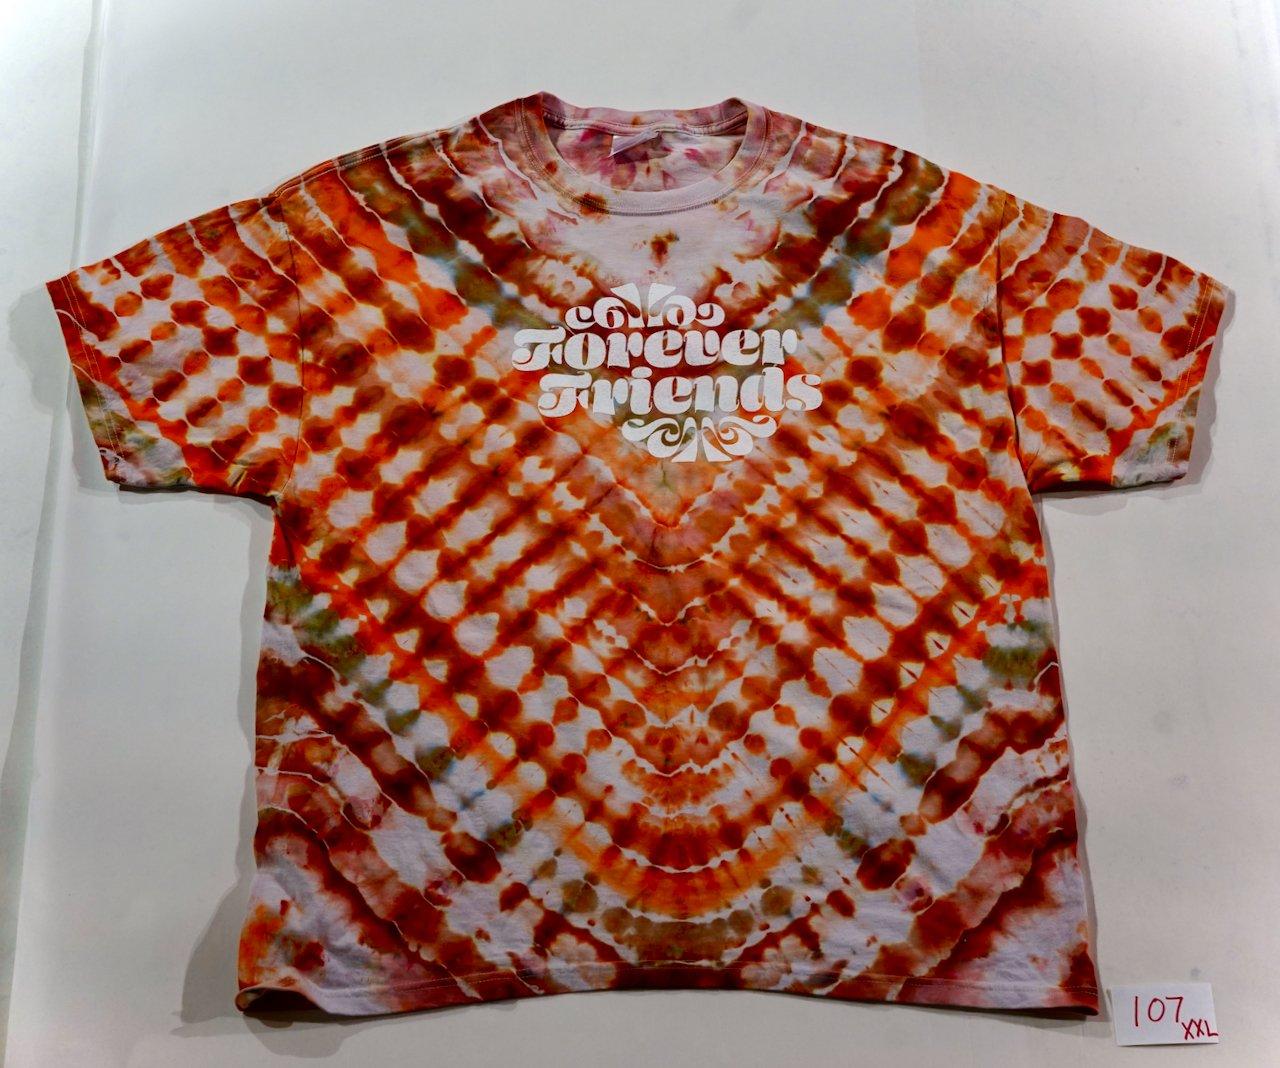 2 X Large T-Shirt (107)